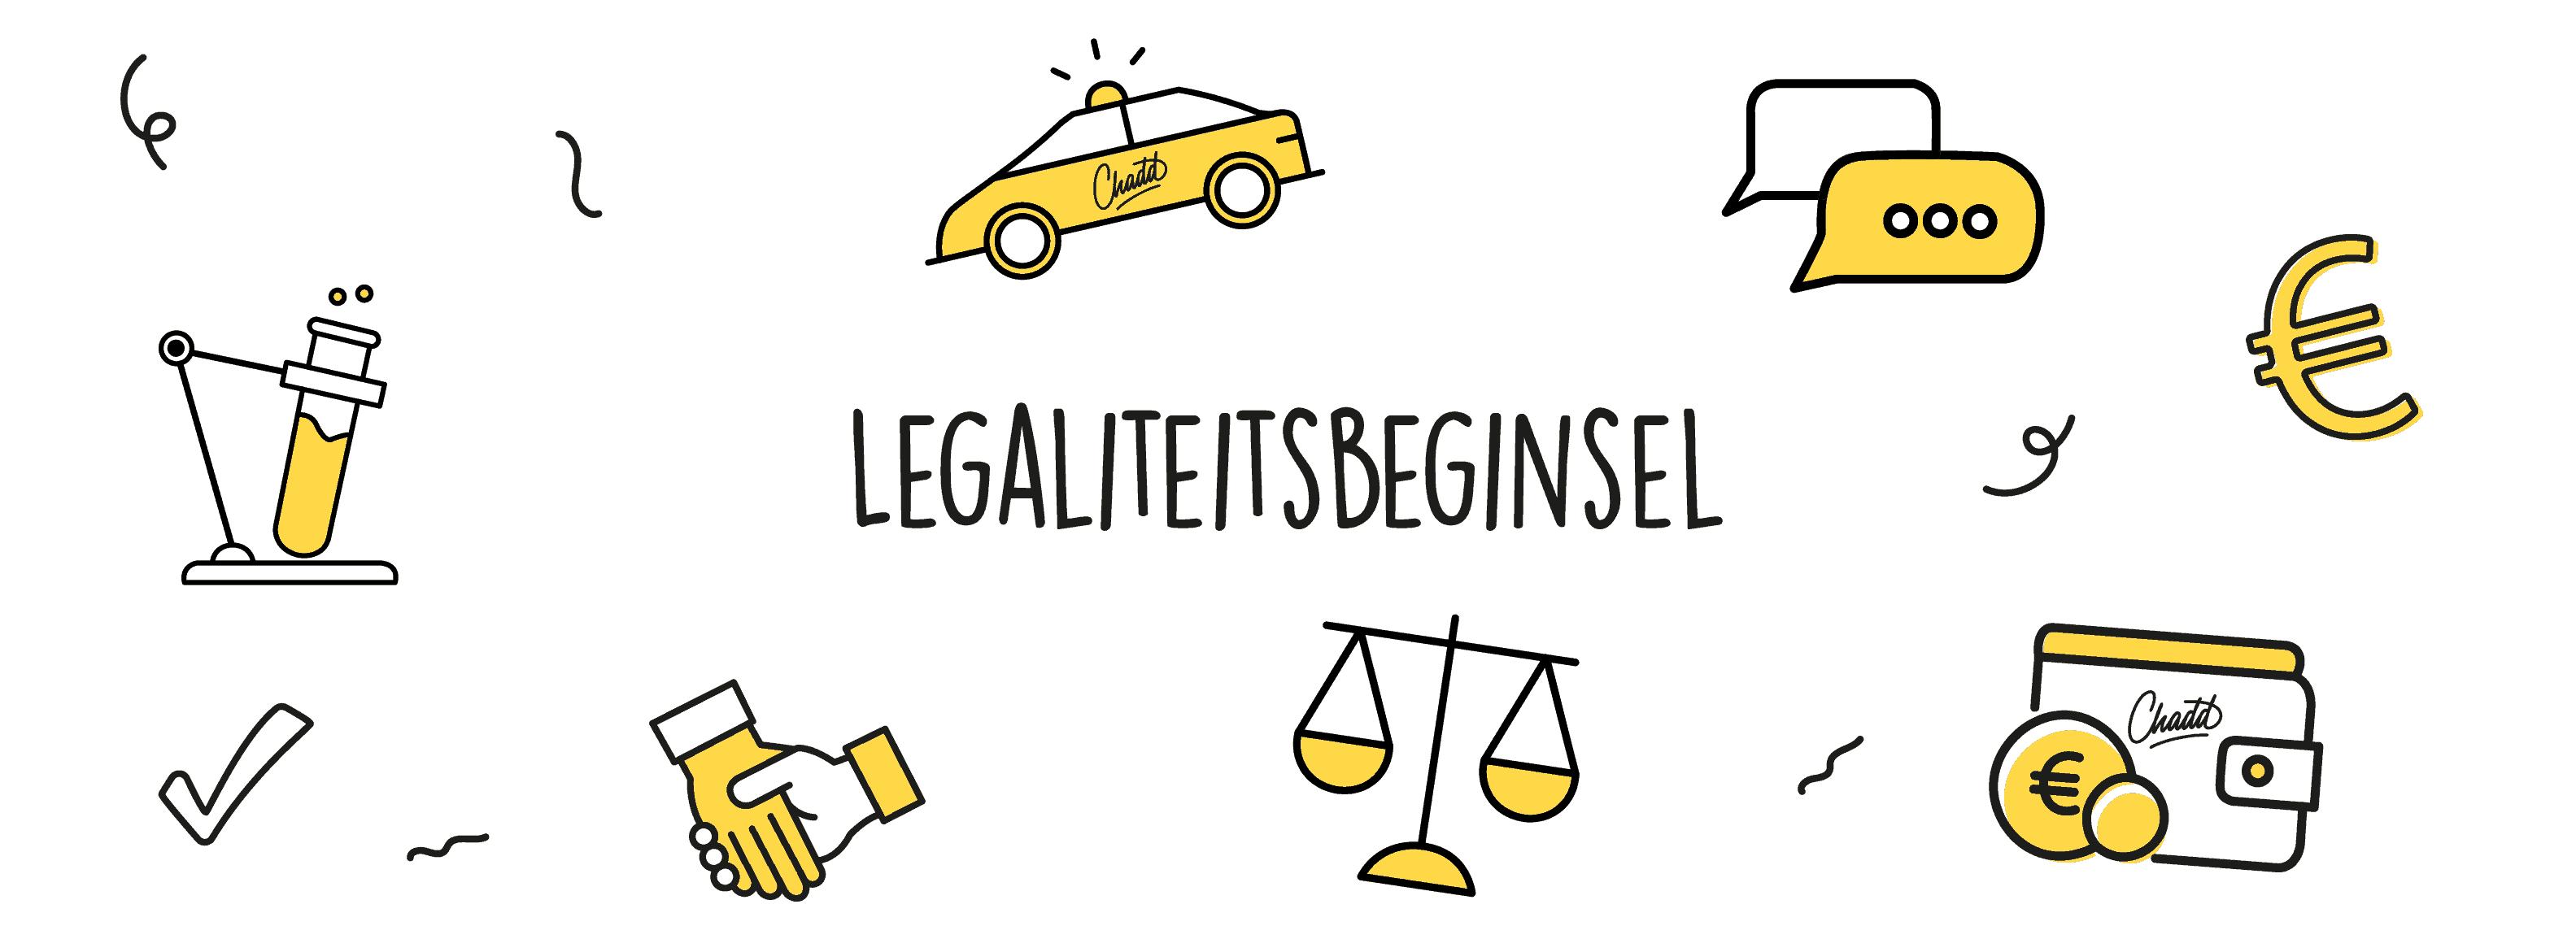 Legaliteitsbeginsel